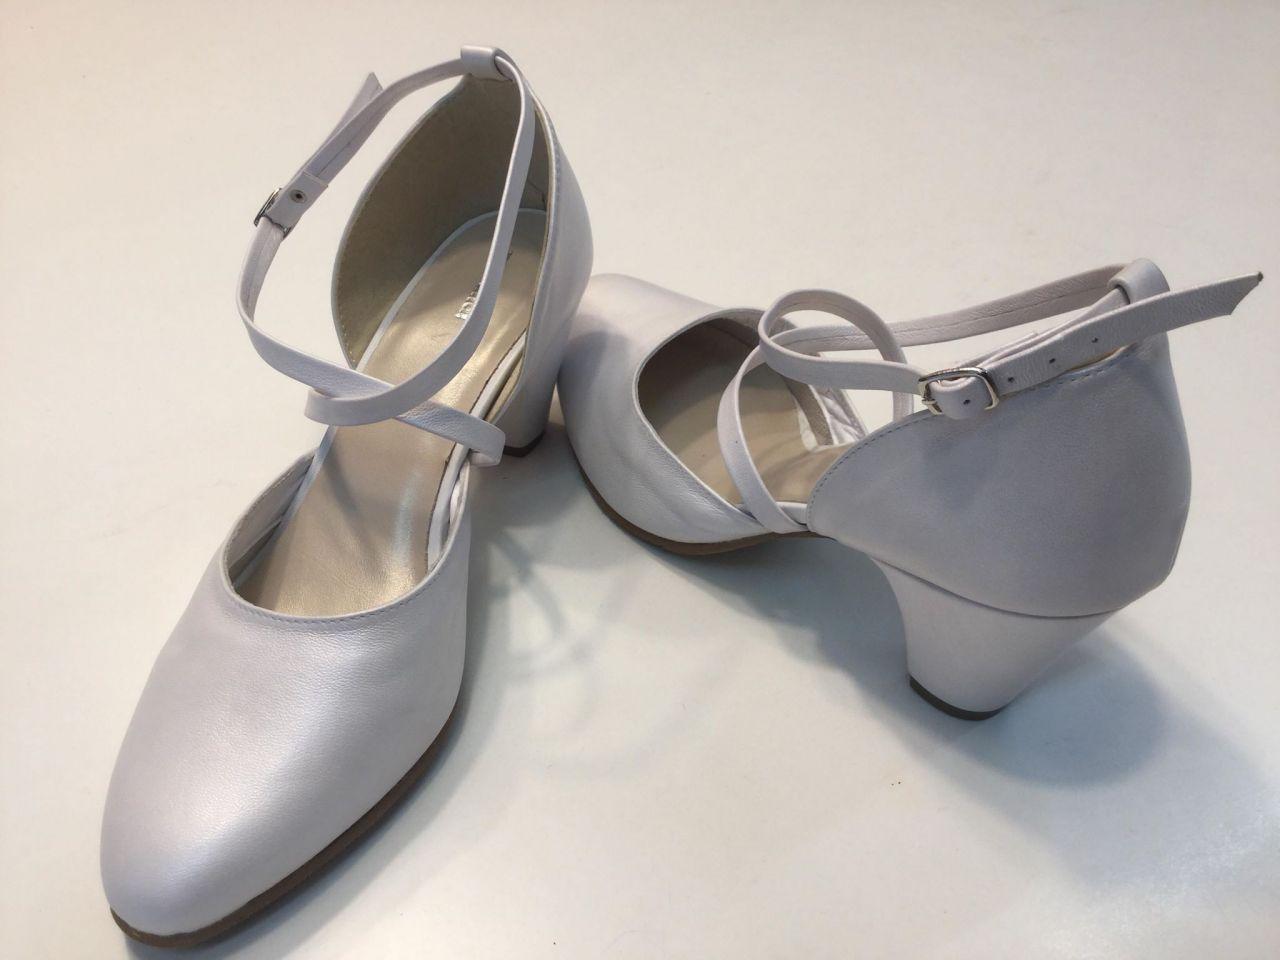 17-904 Morandi fehér női bőrcipő 4 cm-es sarokkal